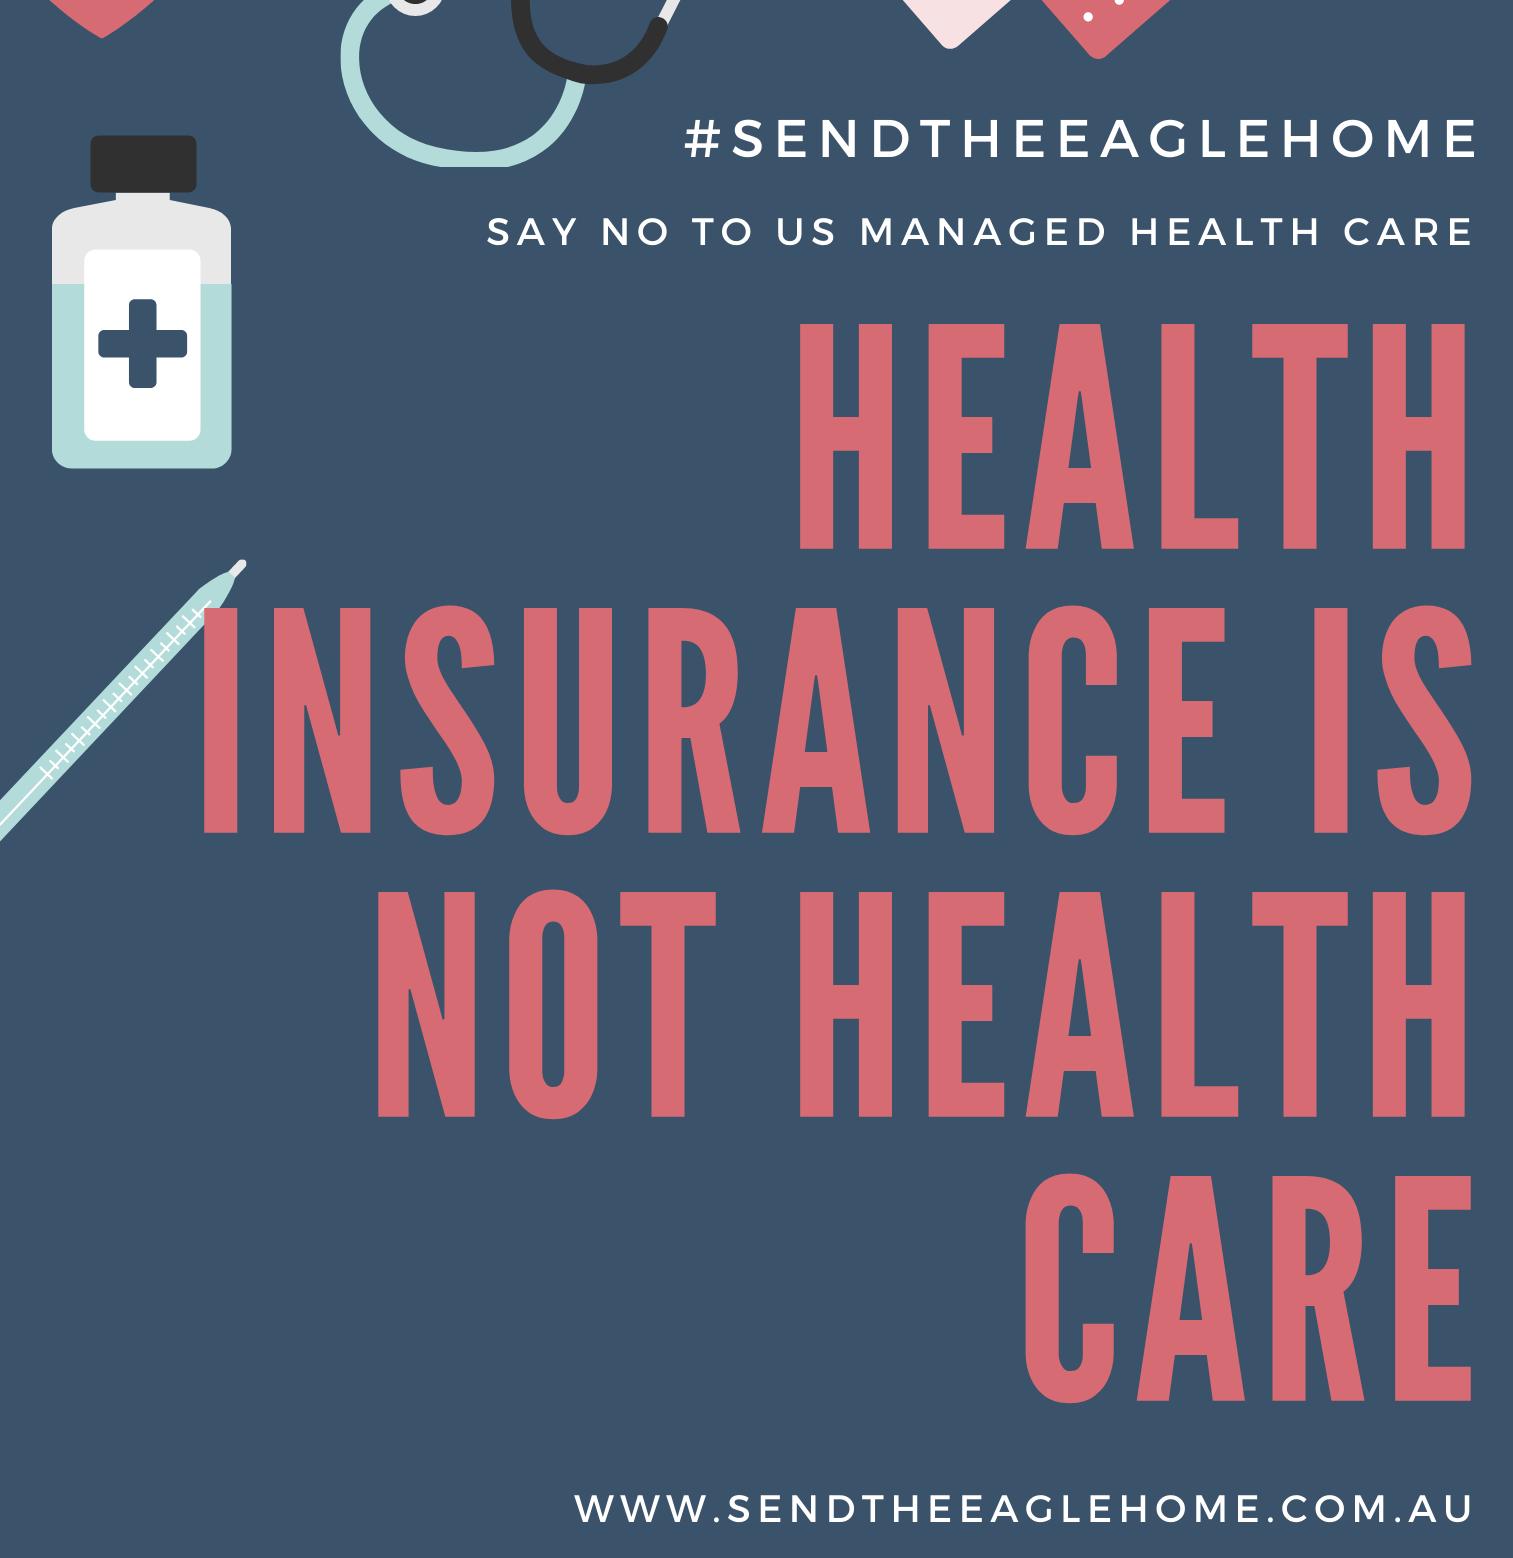 US Managed Care Threatens Australian Health Care